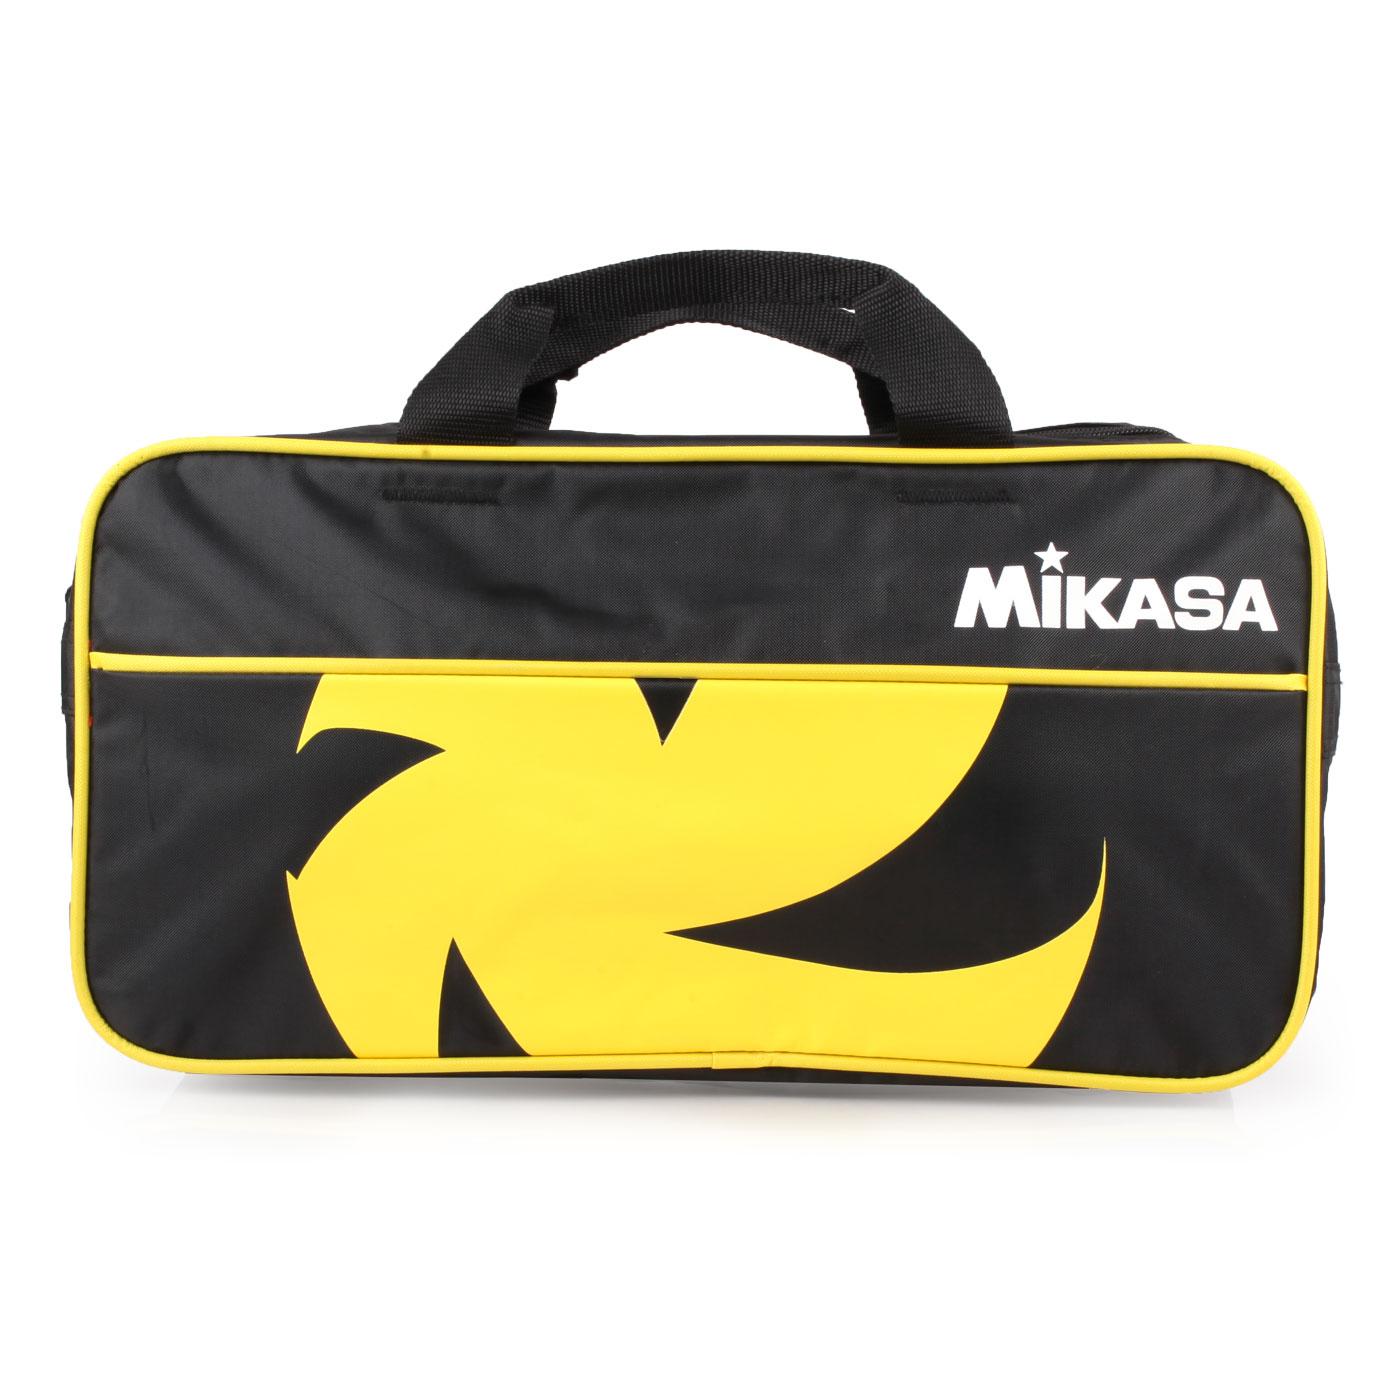 MIKASA 球袋-兩顆裝 MKVL2C-BKY